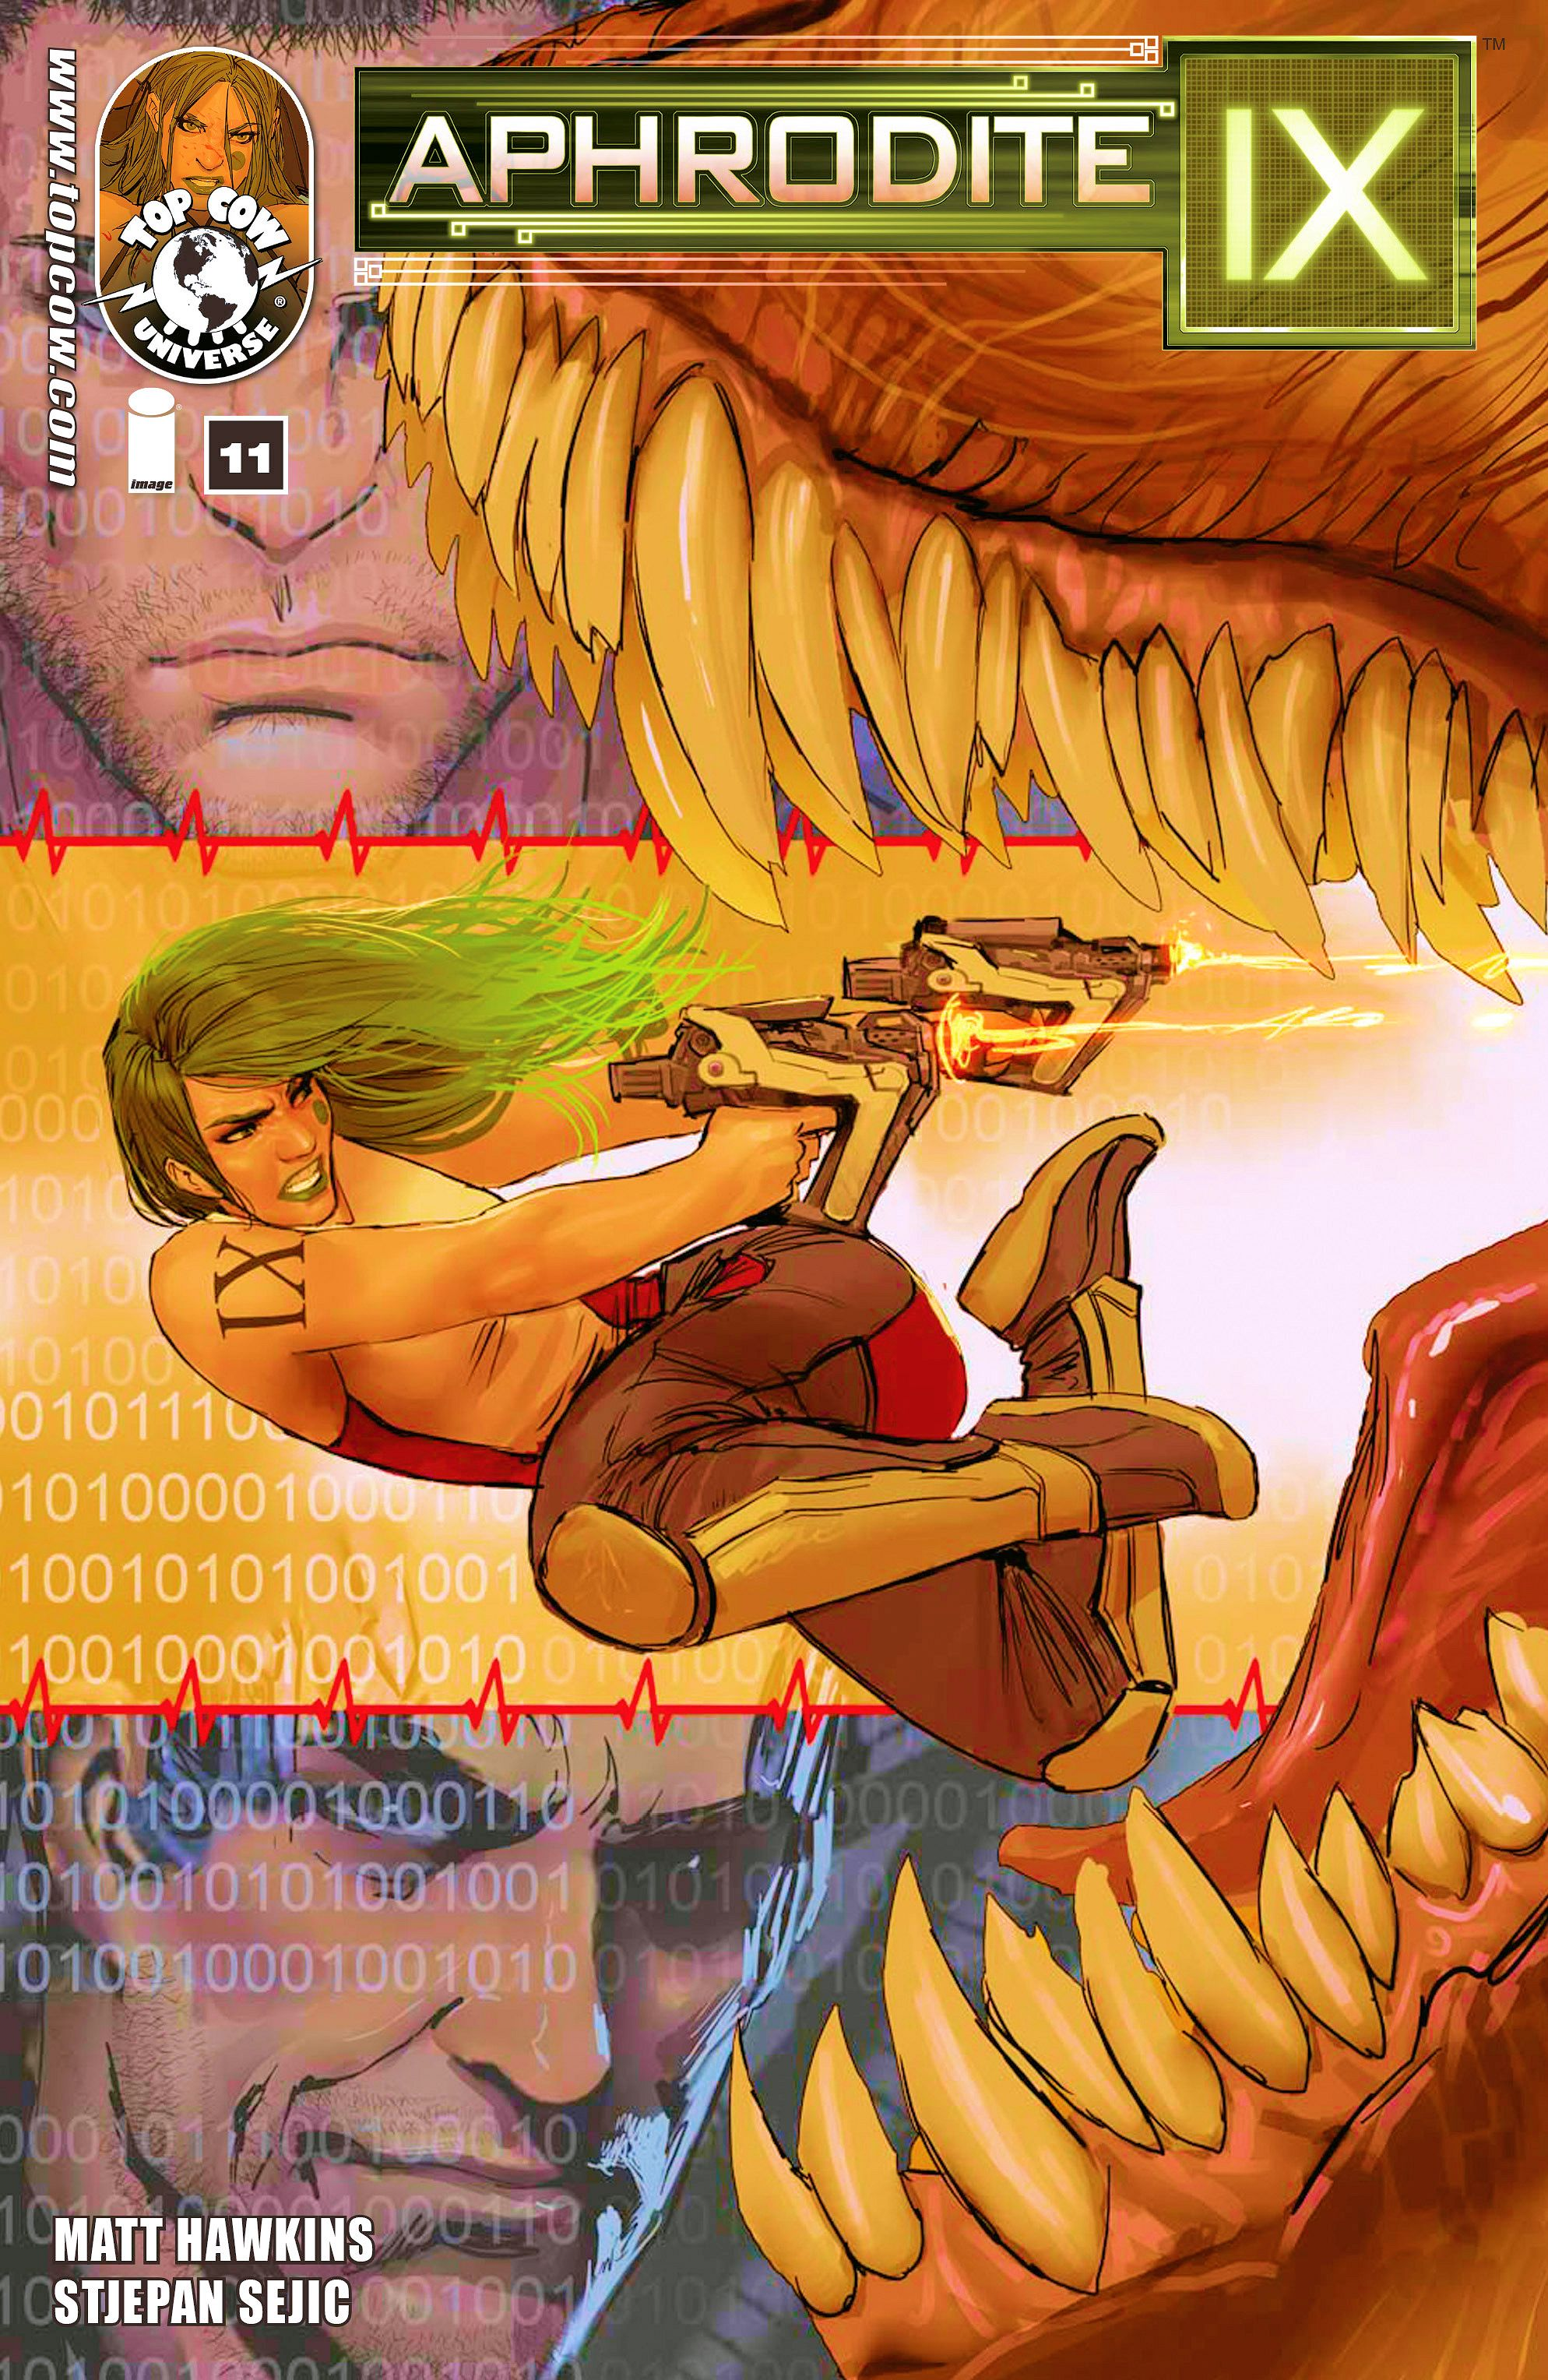 Read online Aphrodite IX (2013) comic -  Issue #11 - 1